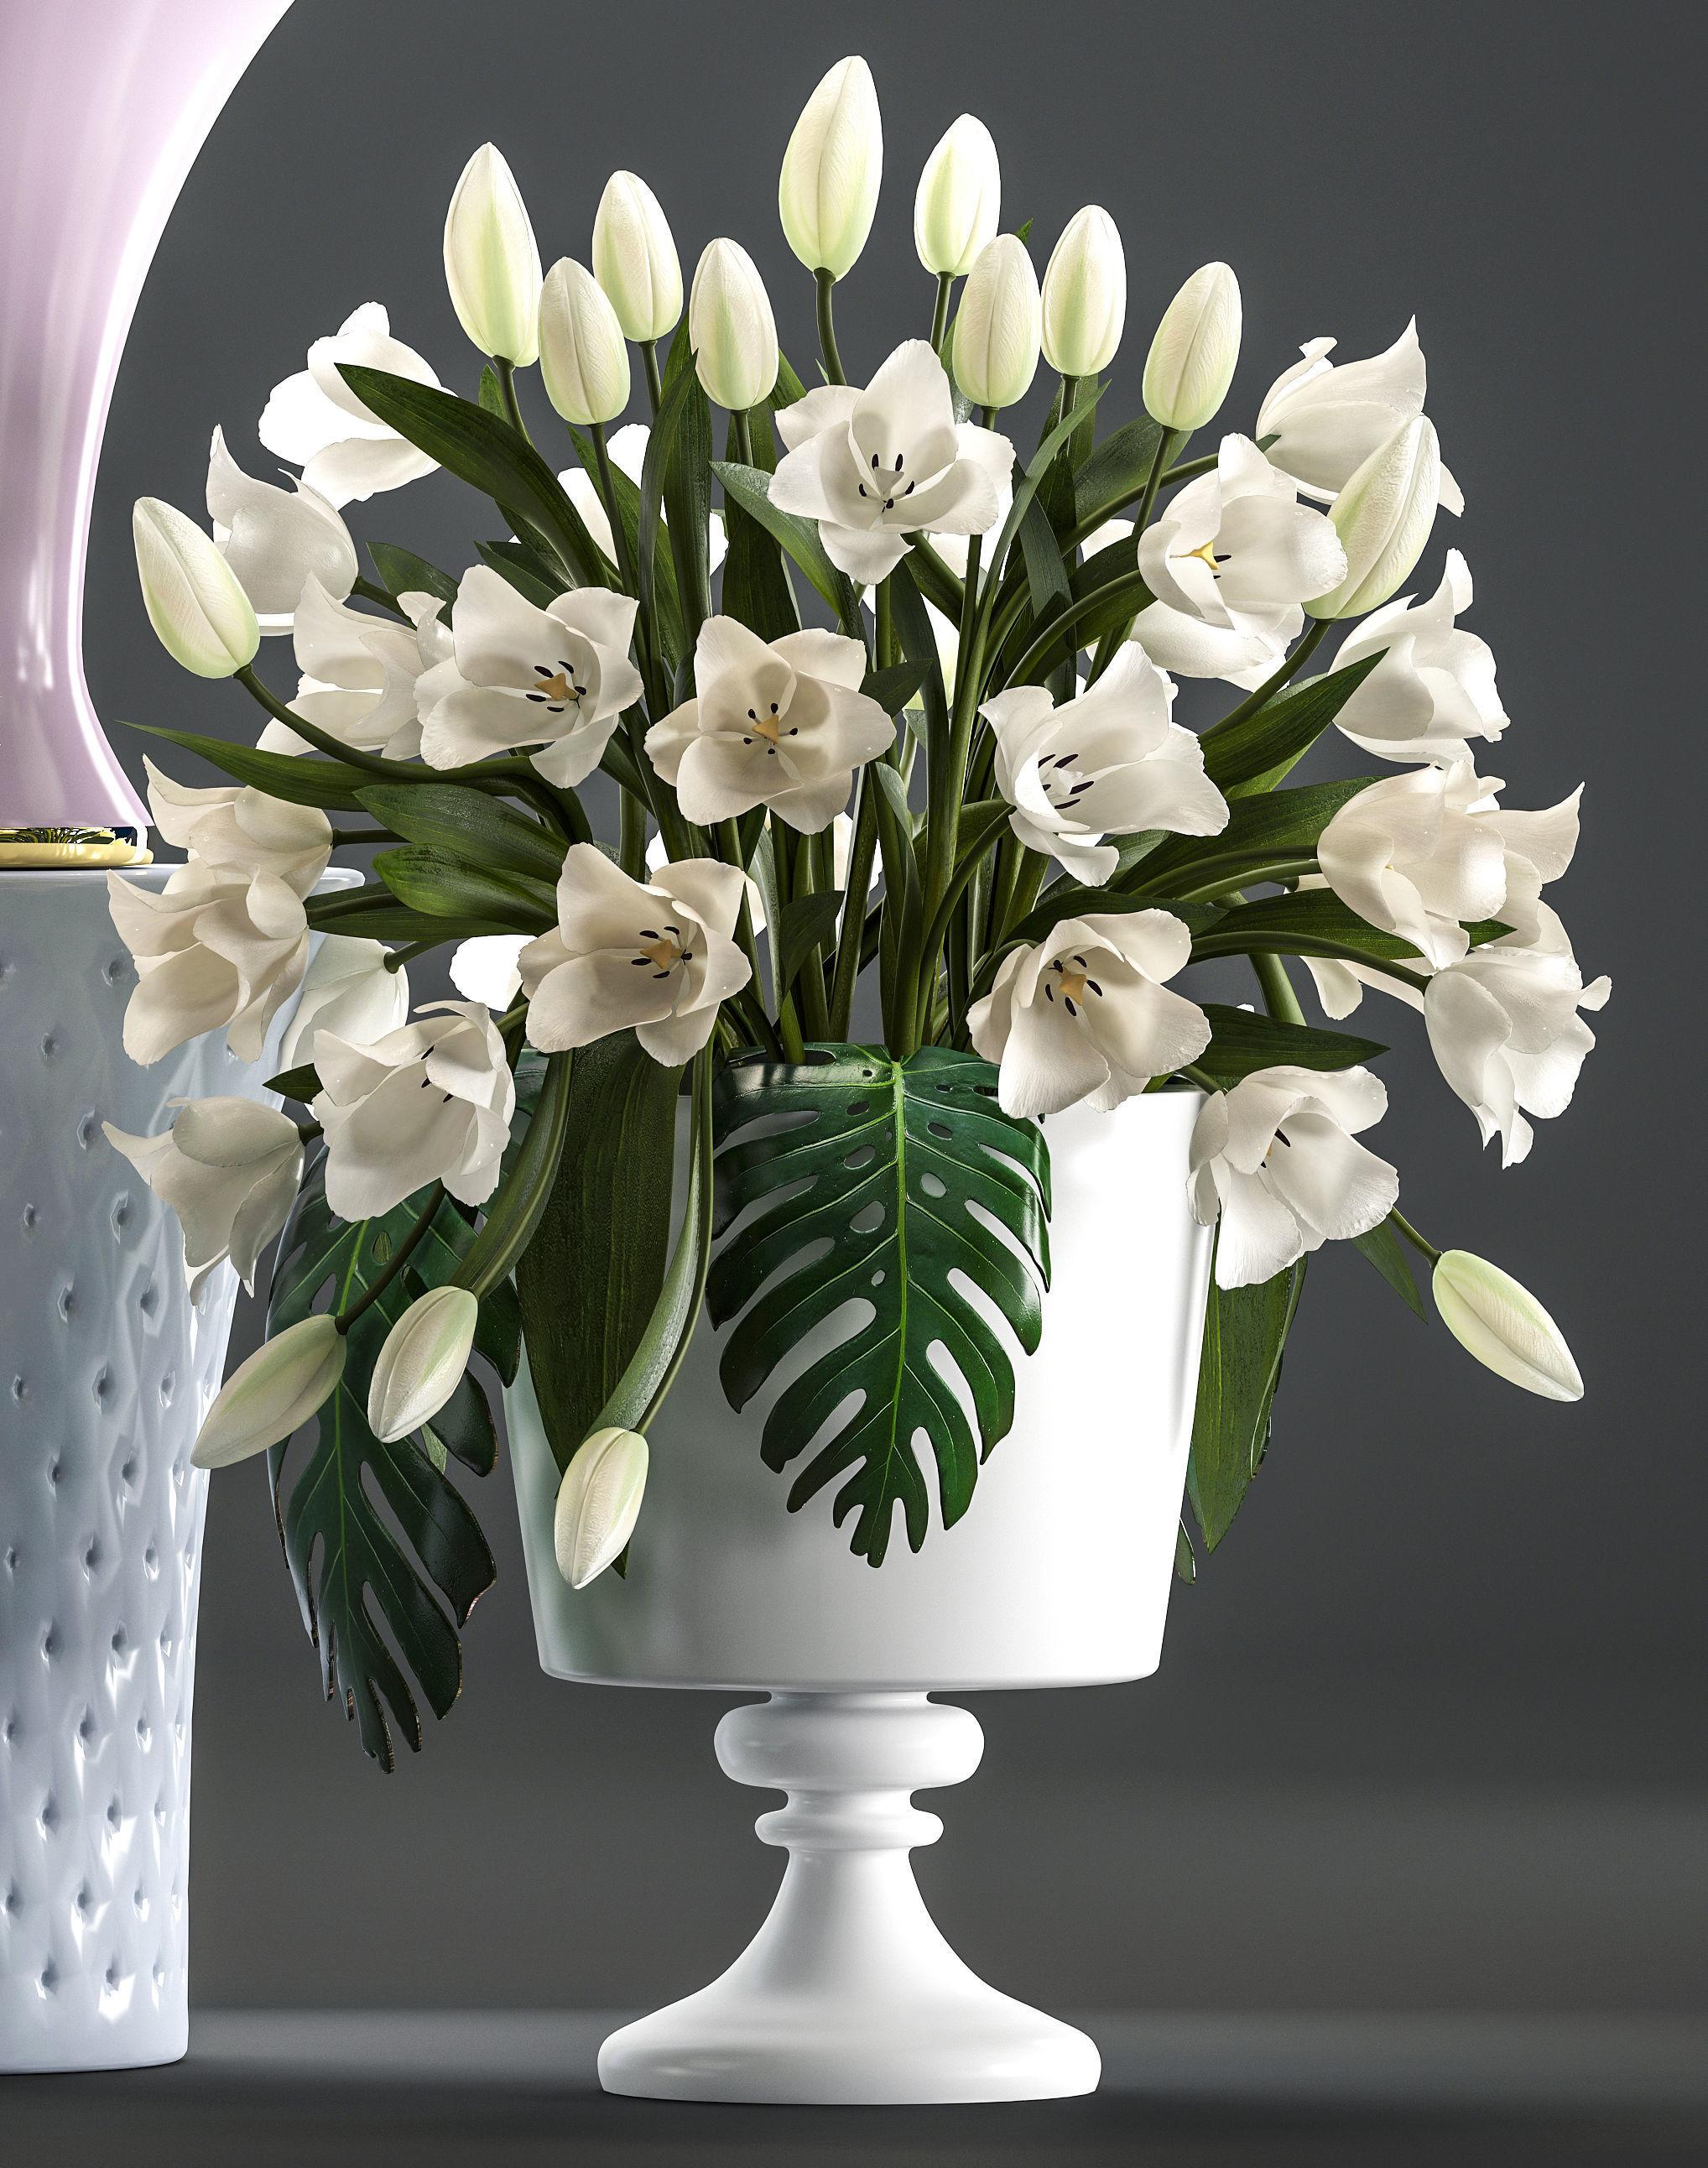 3d model bouquets of white flowers in vases cgtrader bouquets of white flowers in vases 3d model max obj mtl fbx 3 izmirmasajfo